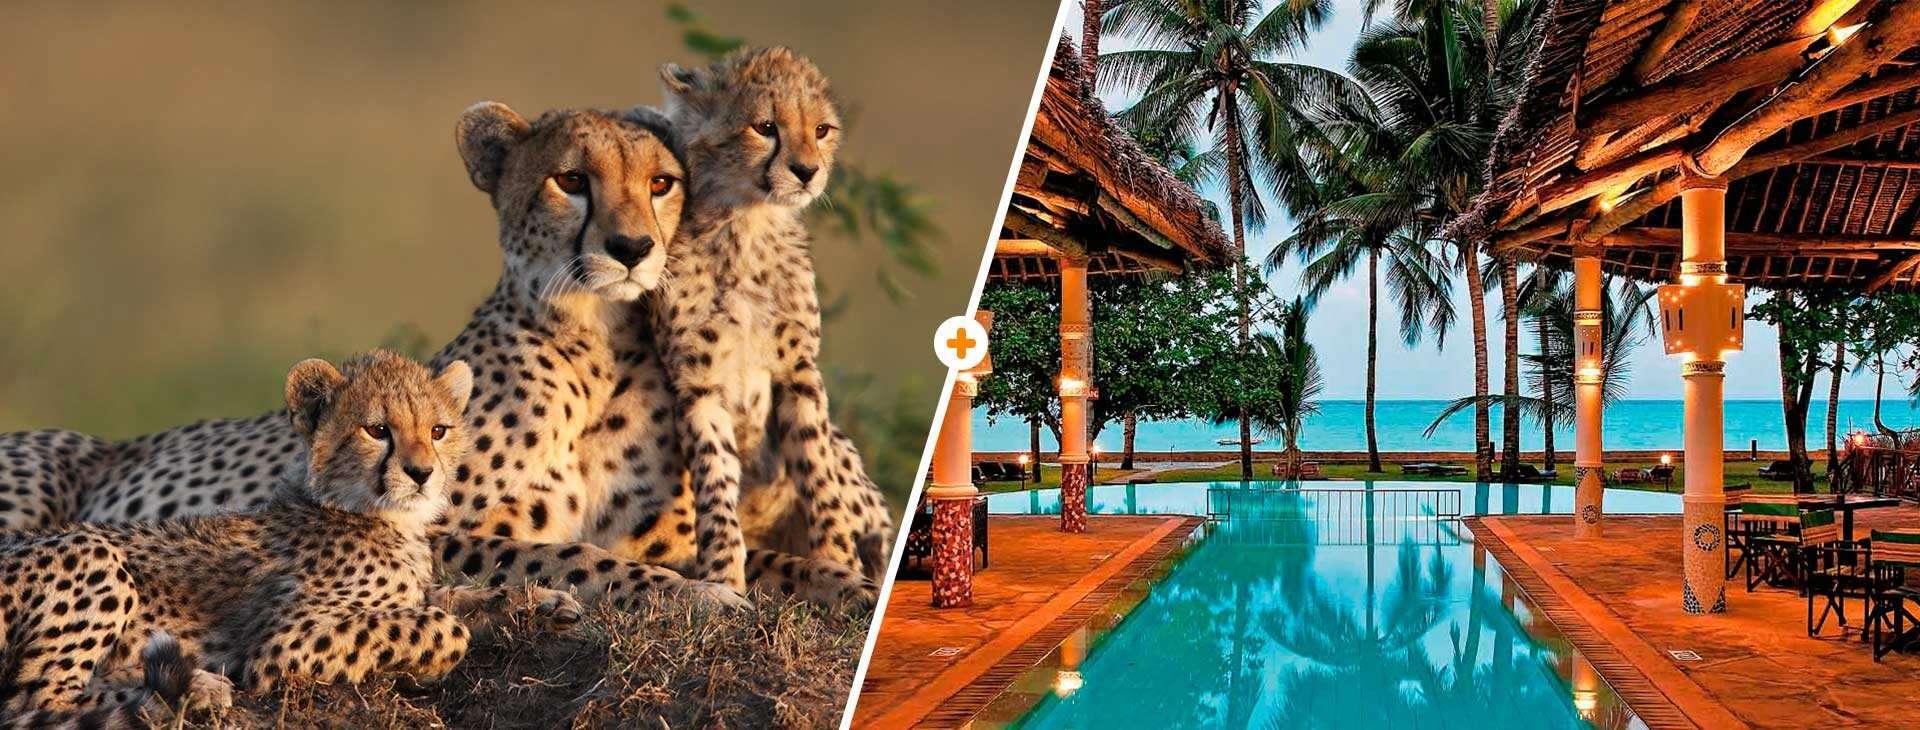 Kenijskie Trio / Neptune Village Resort - basen